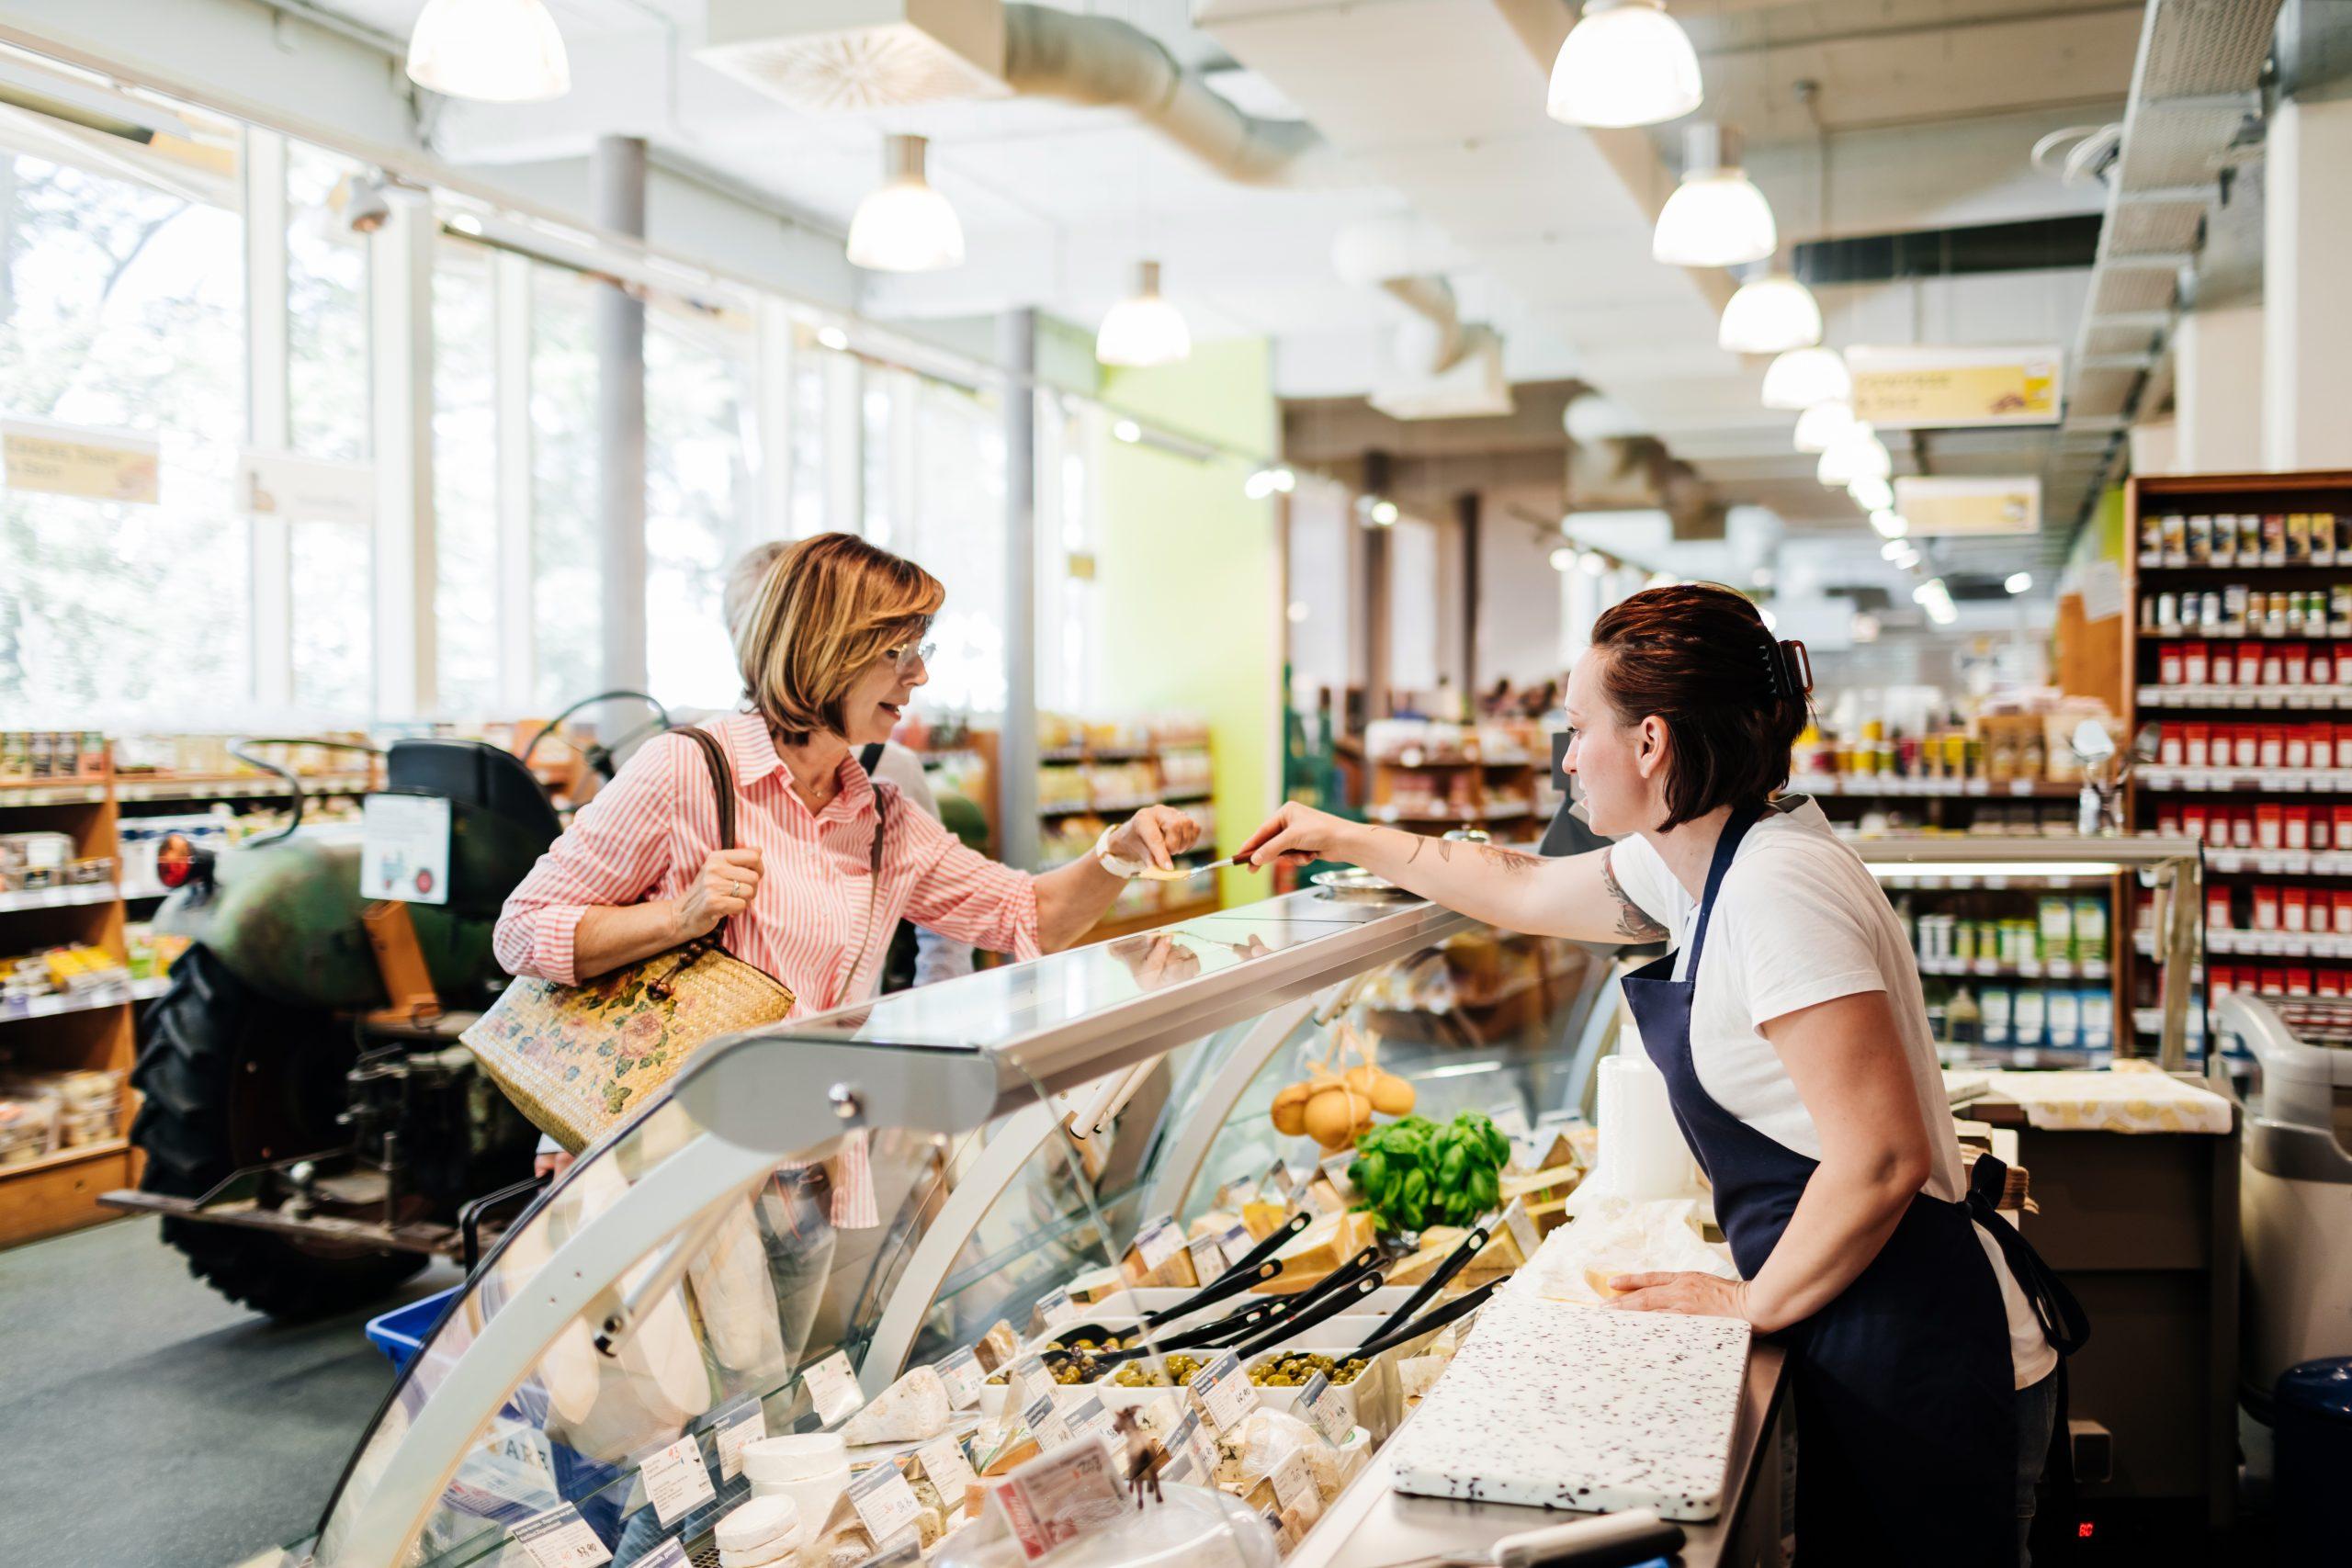 Lady buying fresh food in supermarket